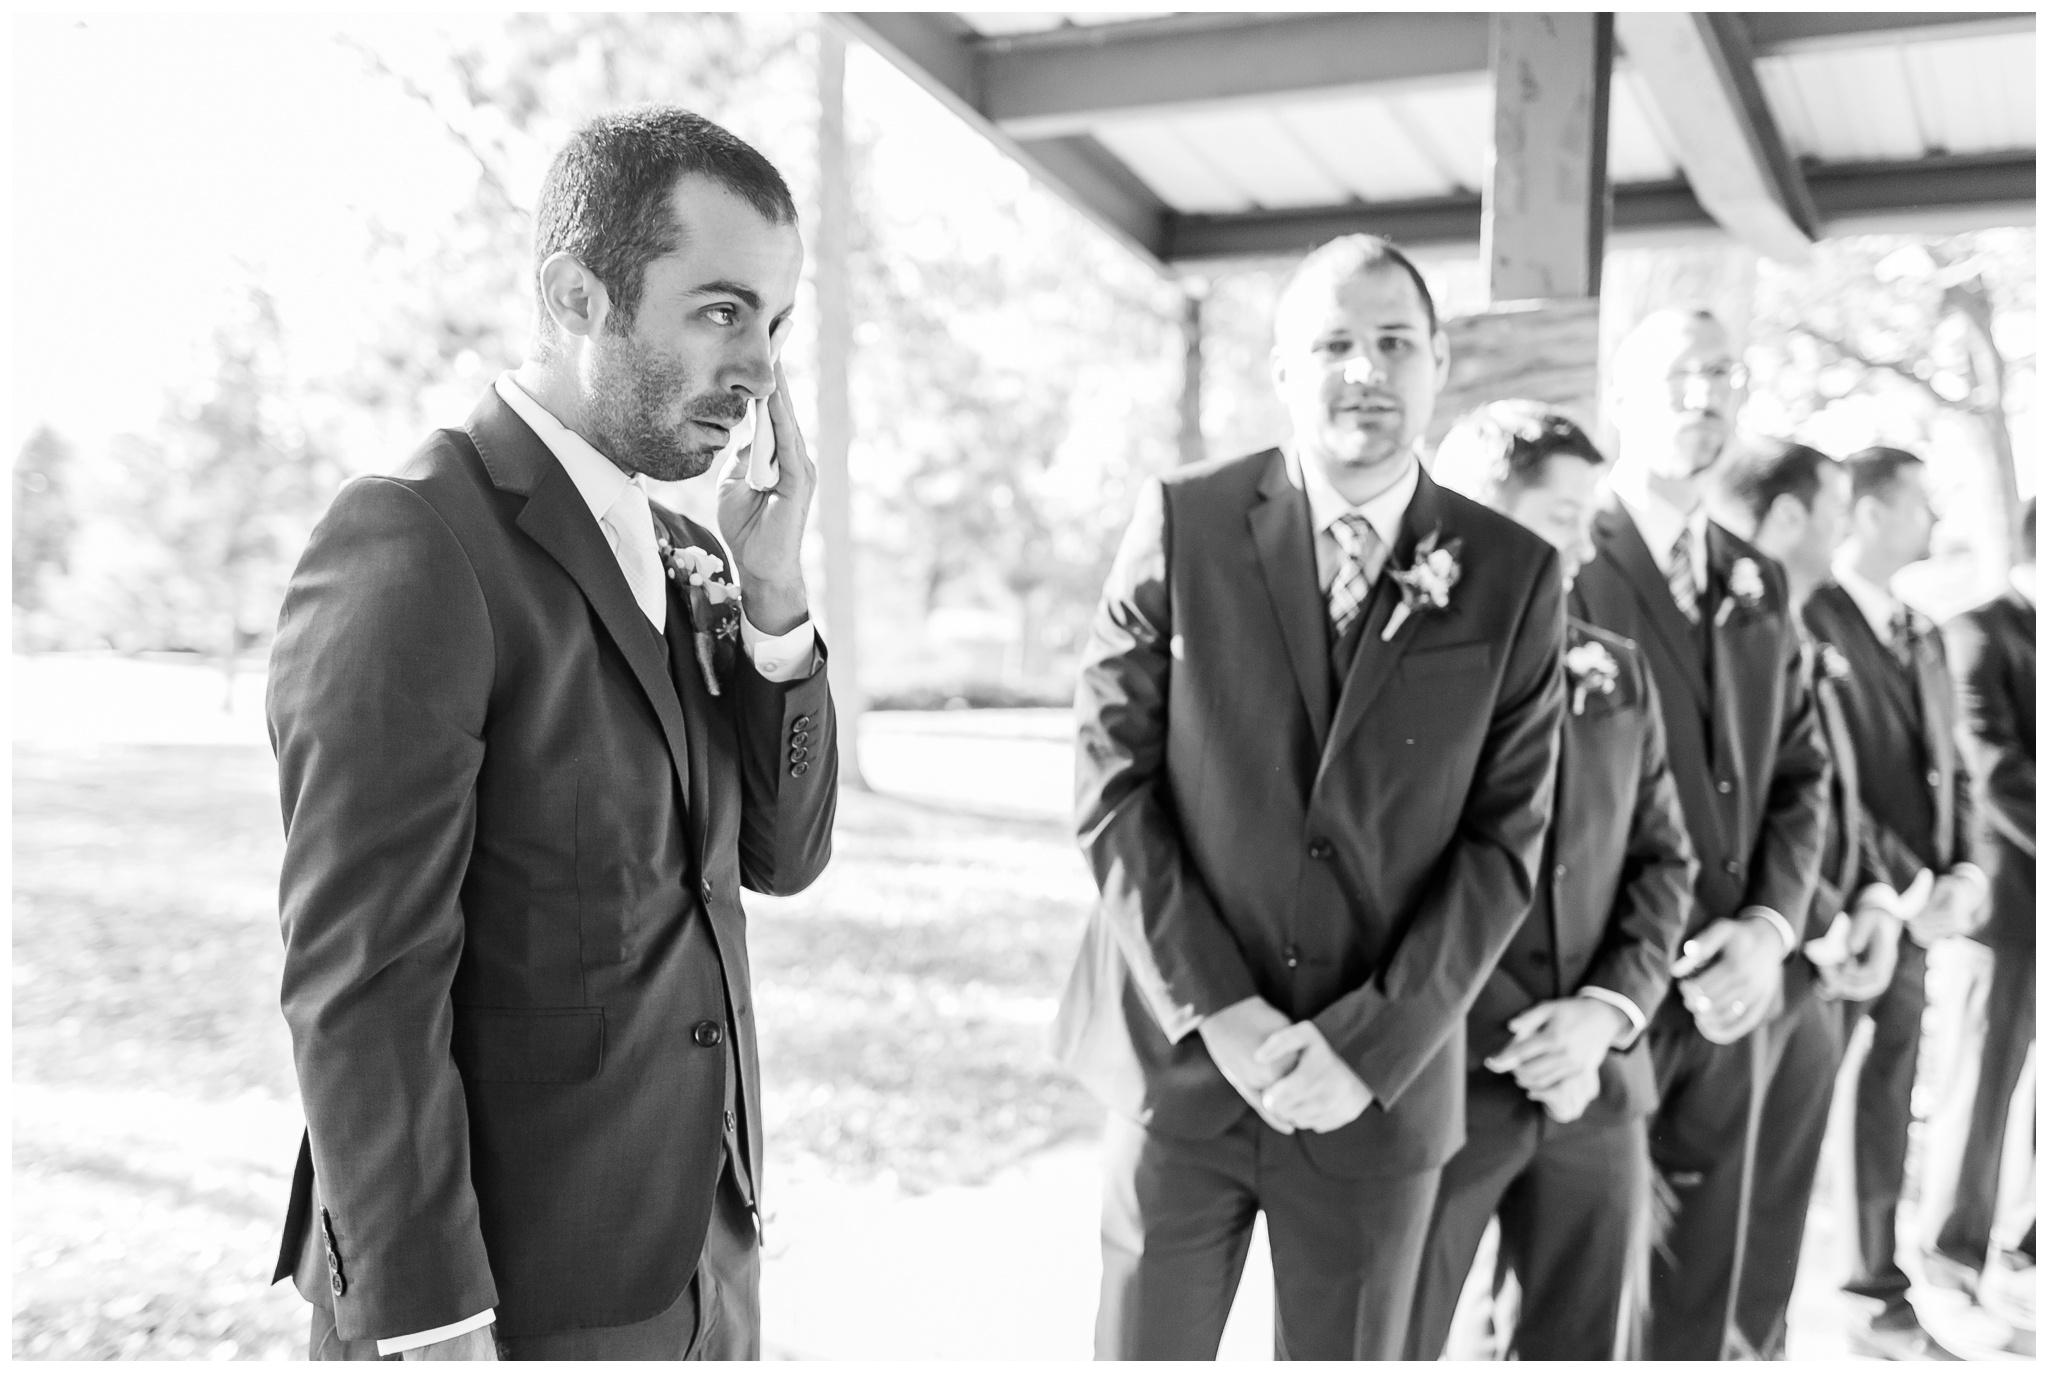 Shawano_County_park_Wedding_Caynay_Photo_Madison_Wi_2285.jpg